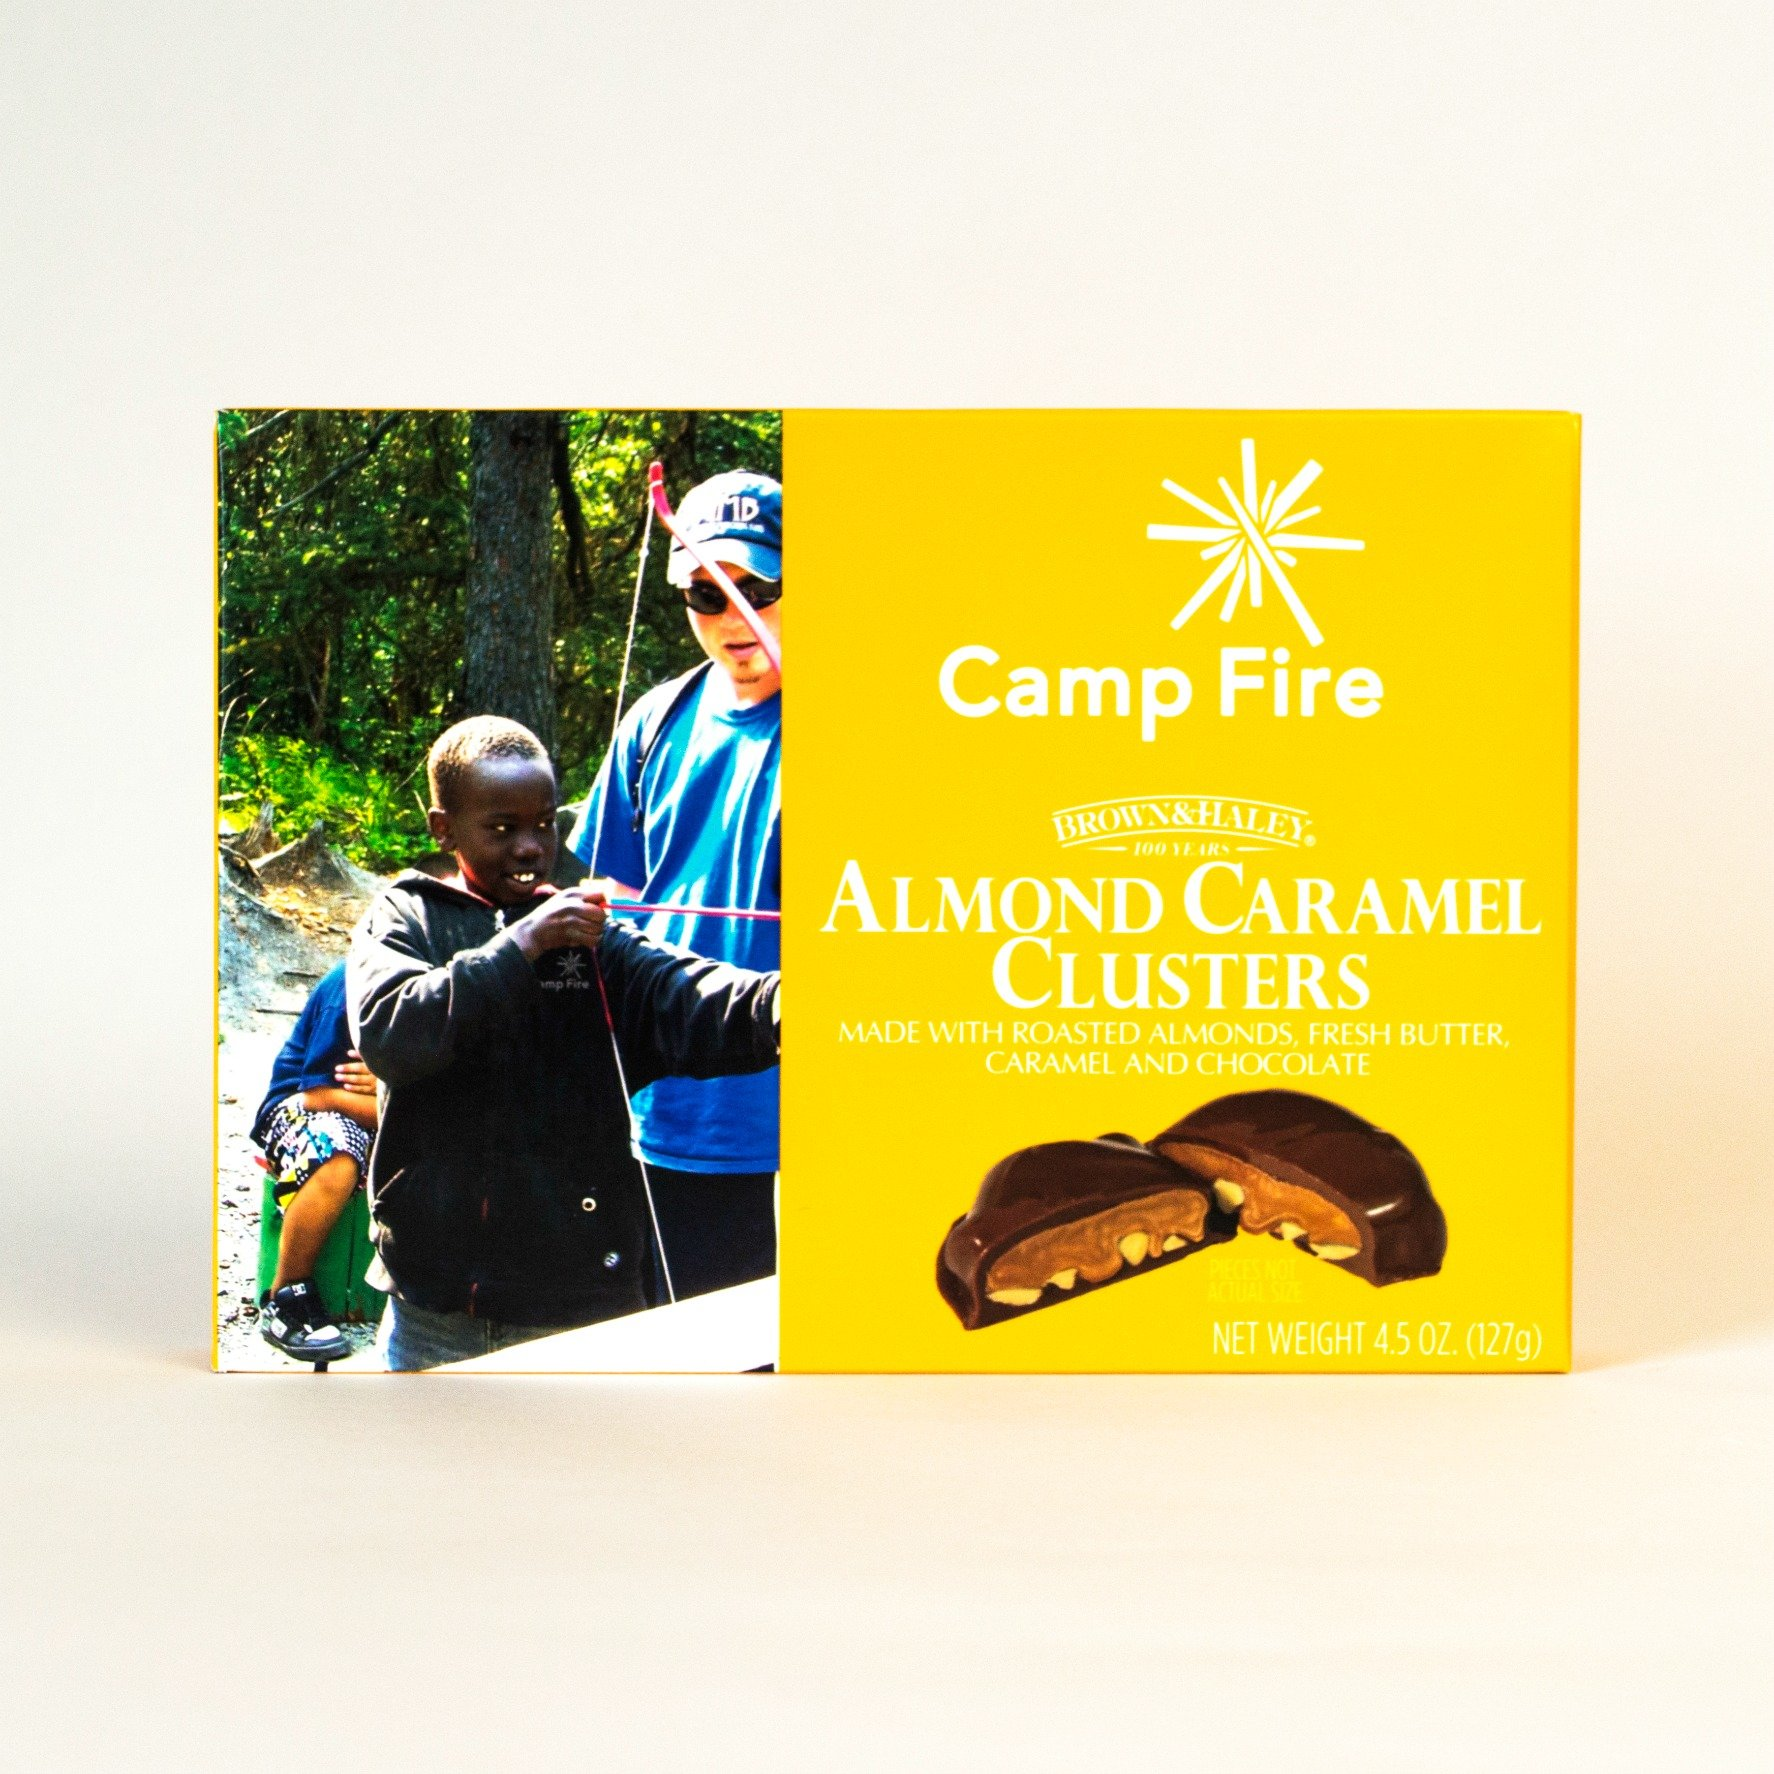 Almond Caramel Clusters